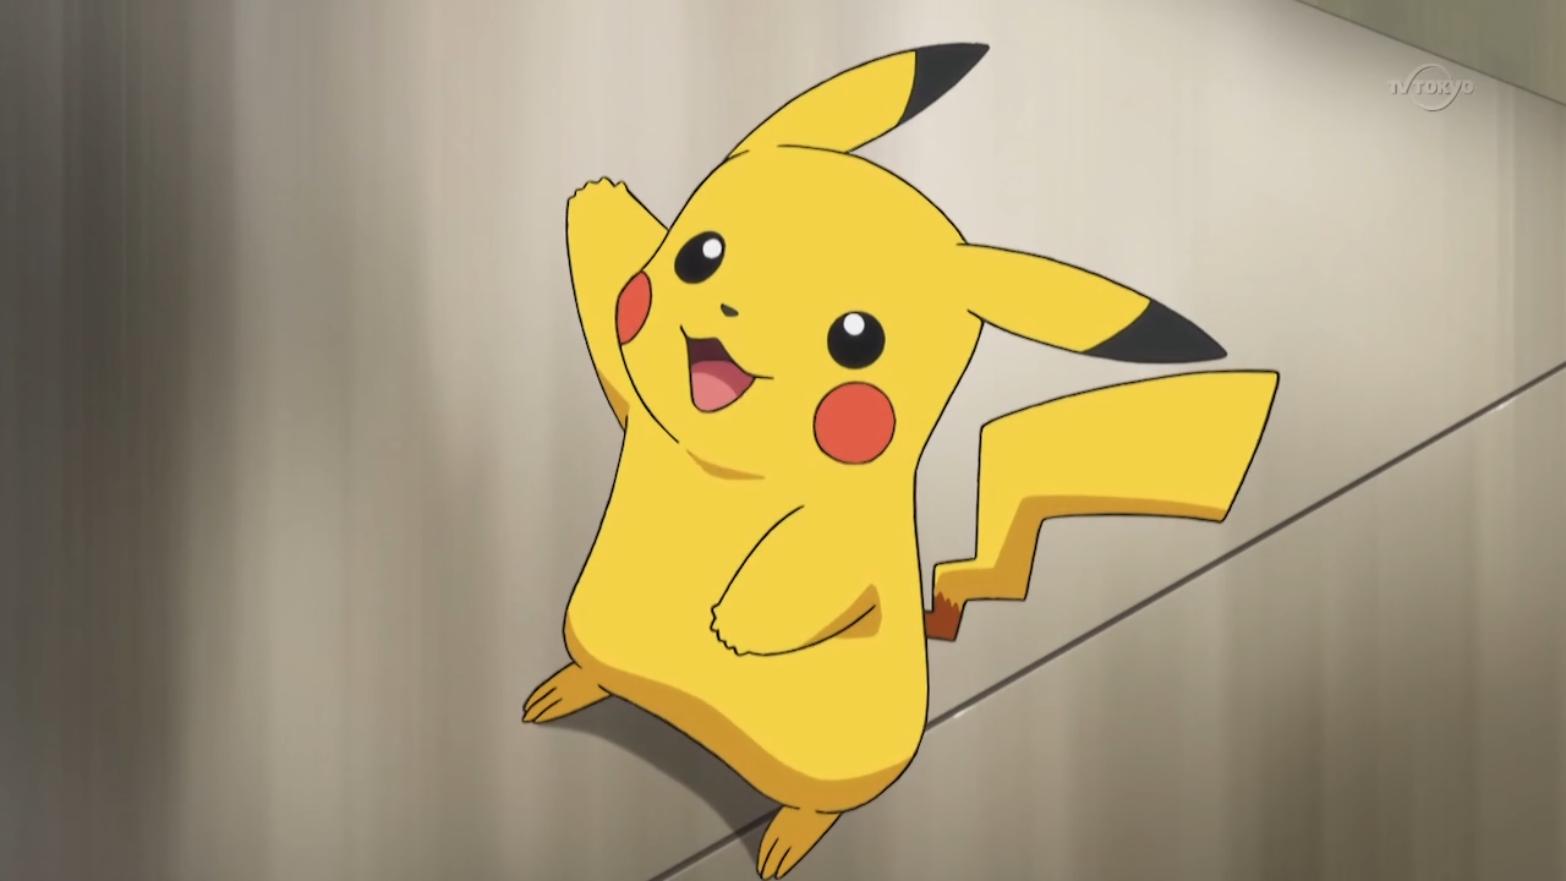 Pikachu Speaks English In The New 'Pokémon' Film & Grown ...